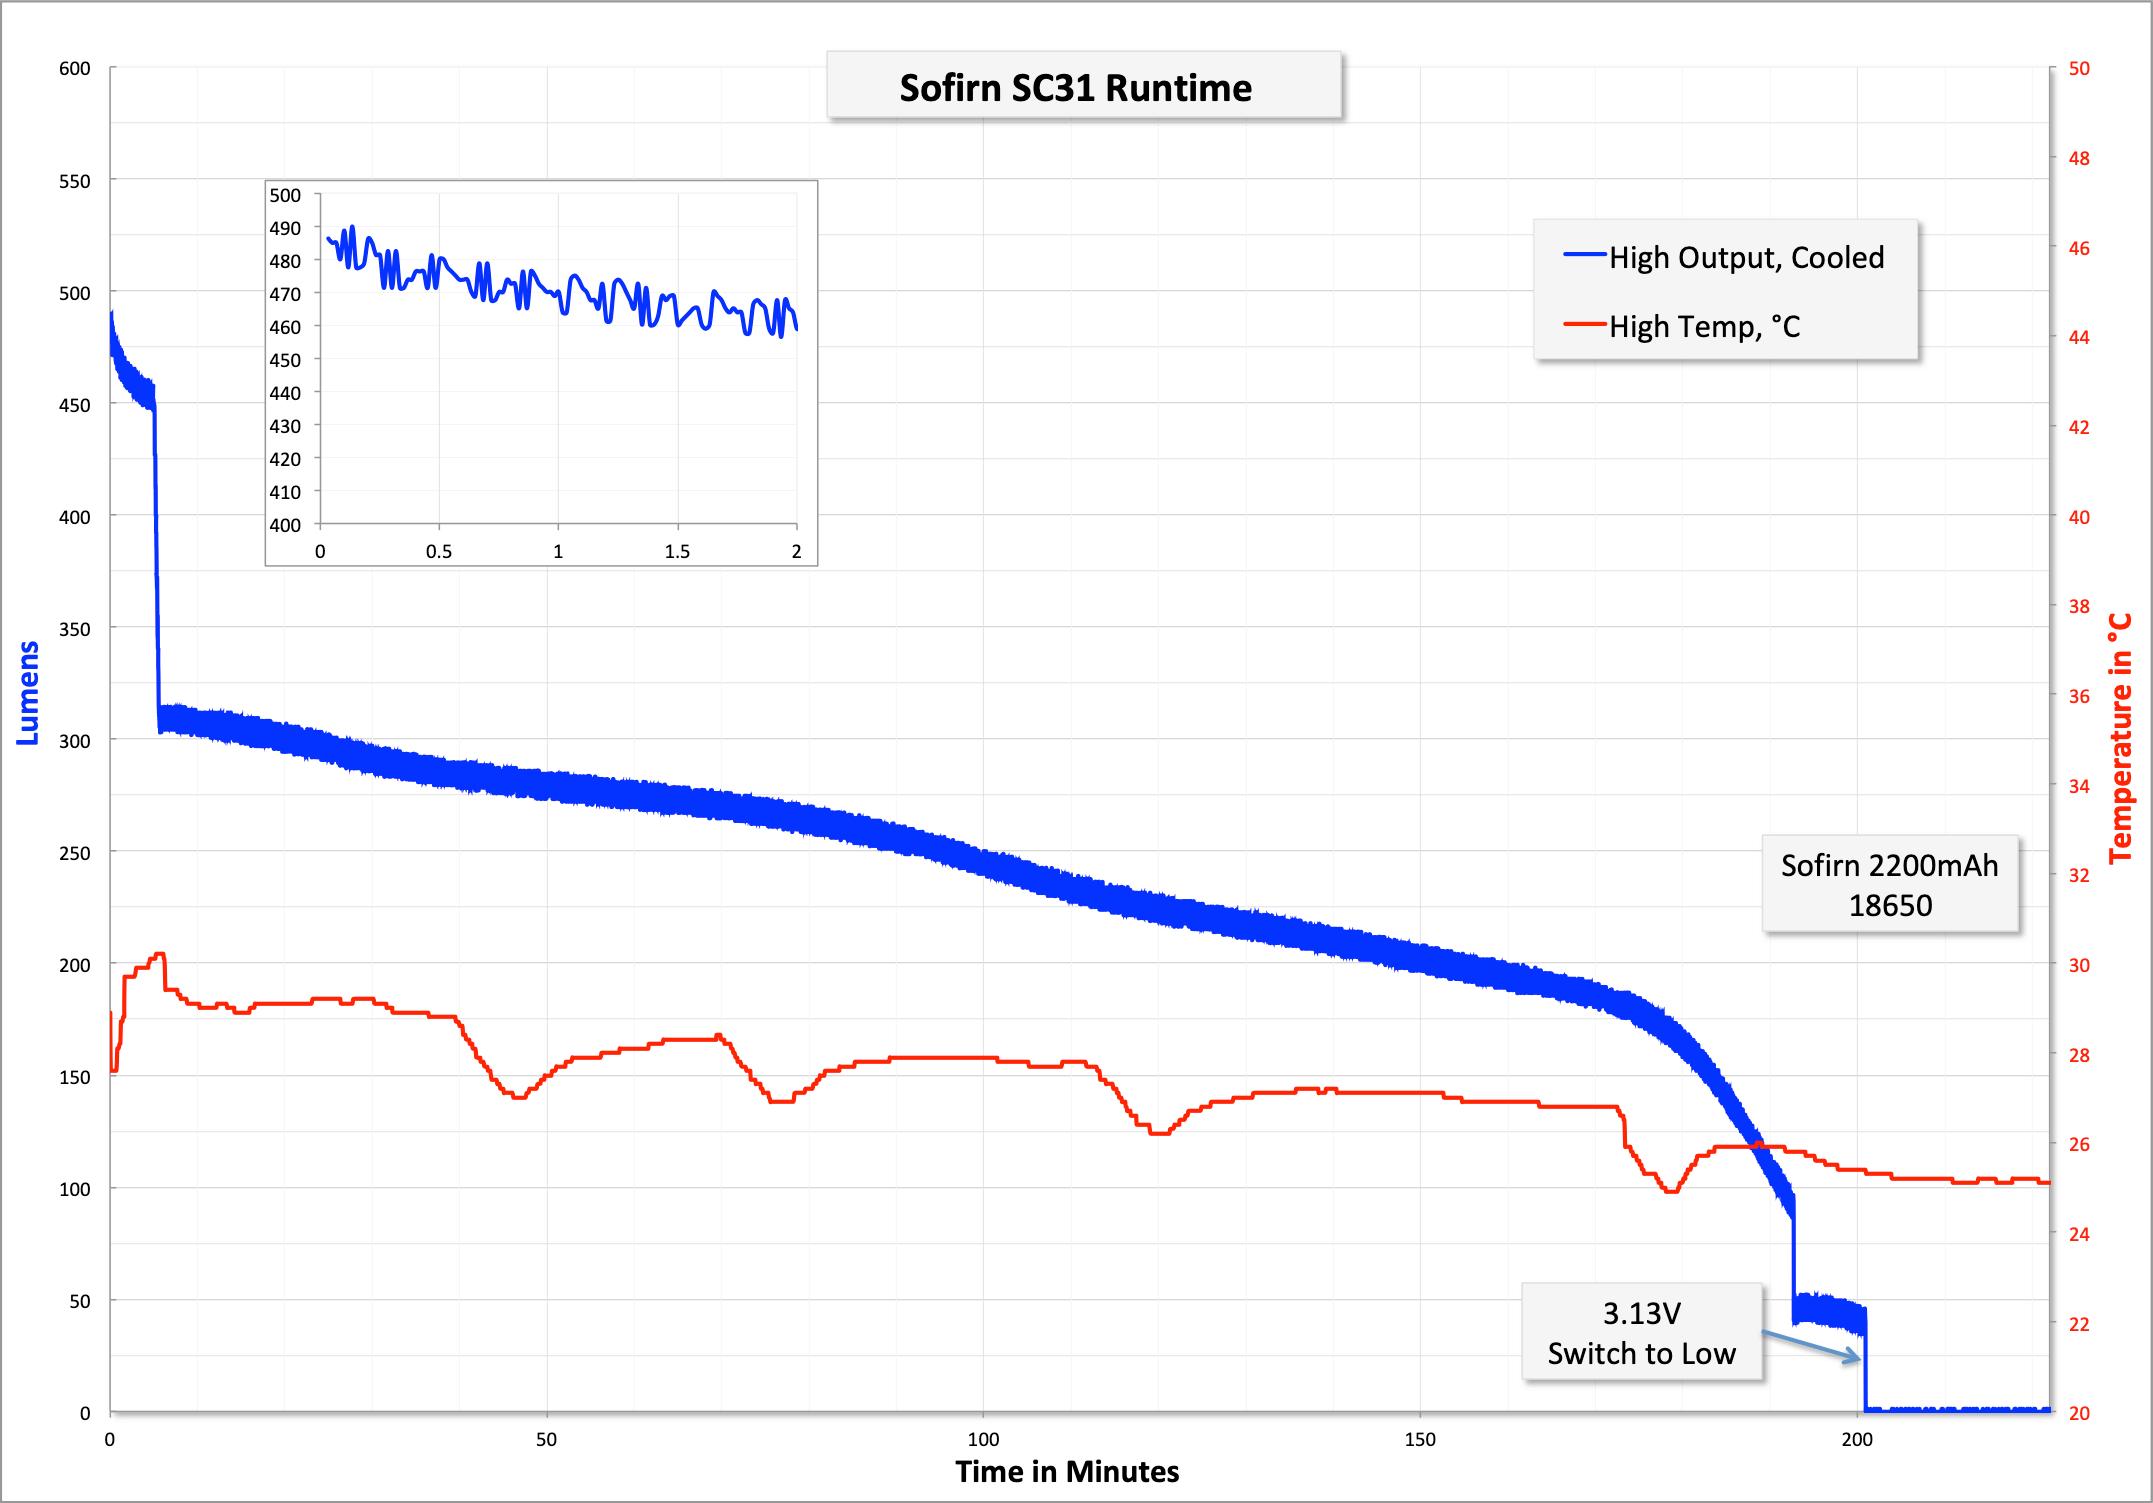 28_zeroair_reviews_sofirn_sc31_18650.png